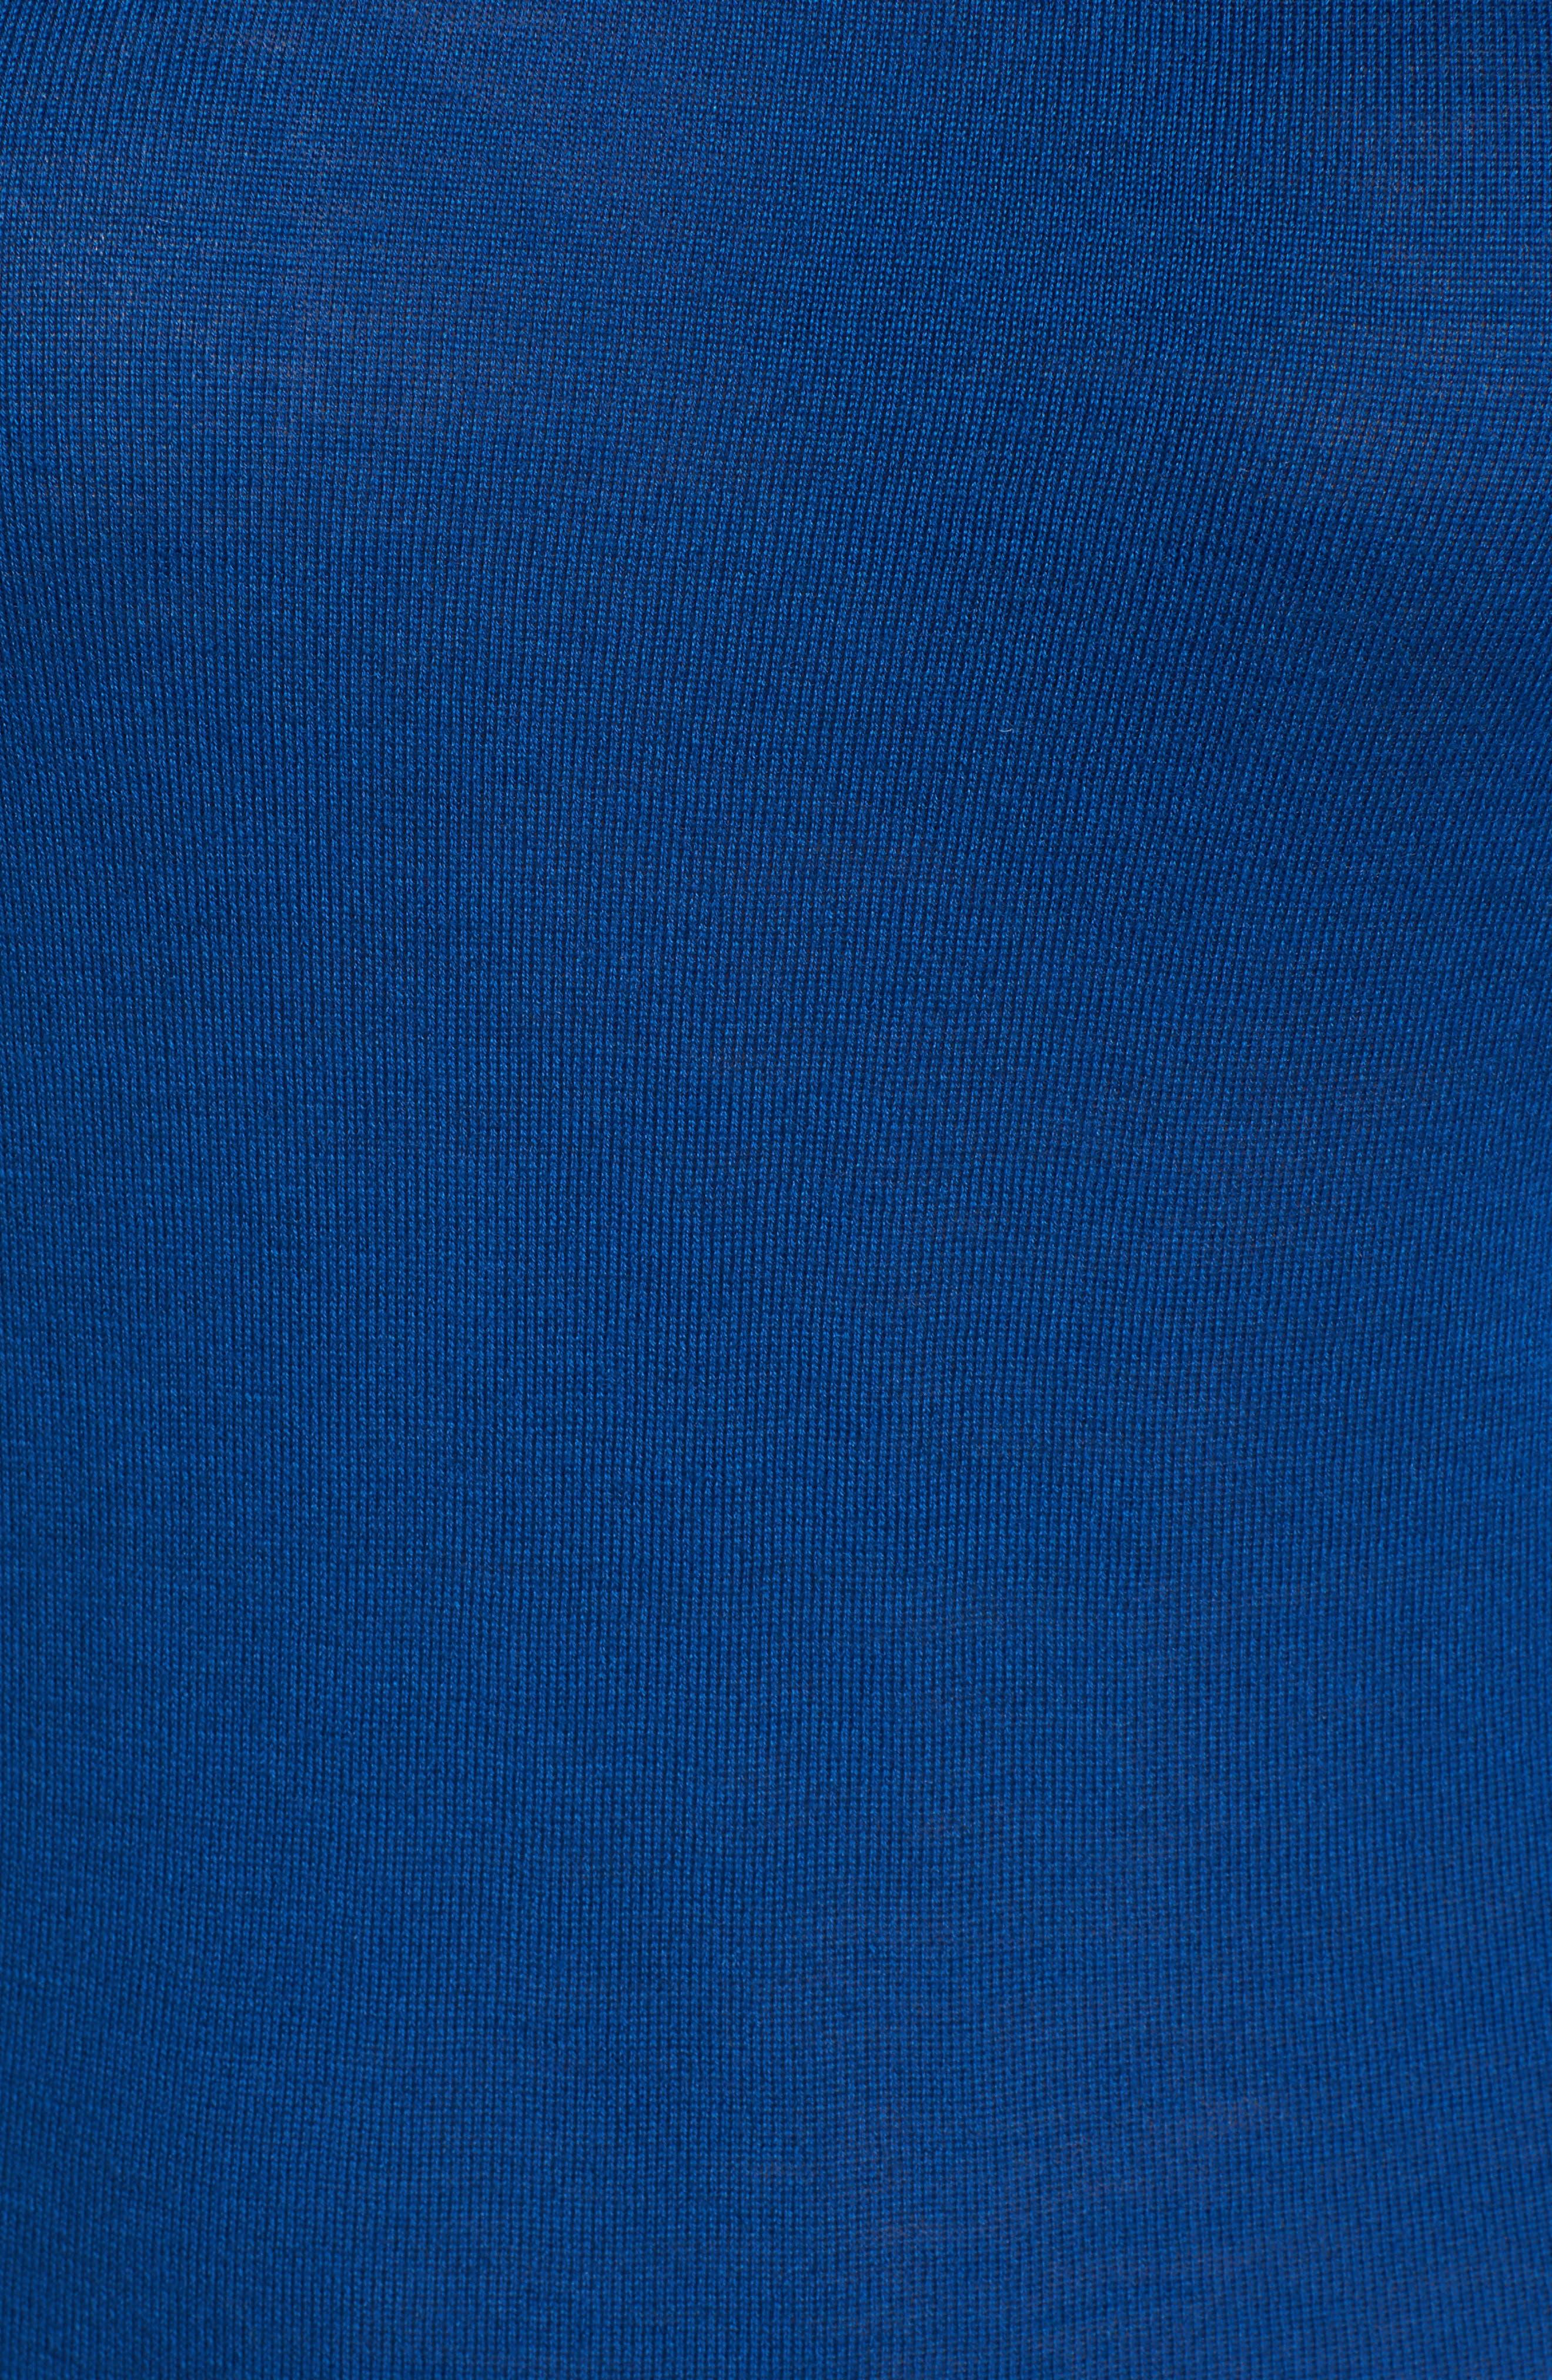 Ferda Colorblock Wool Sweater,                             Alternate thumbnail 5, color,                             471